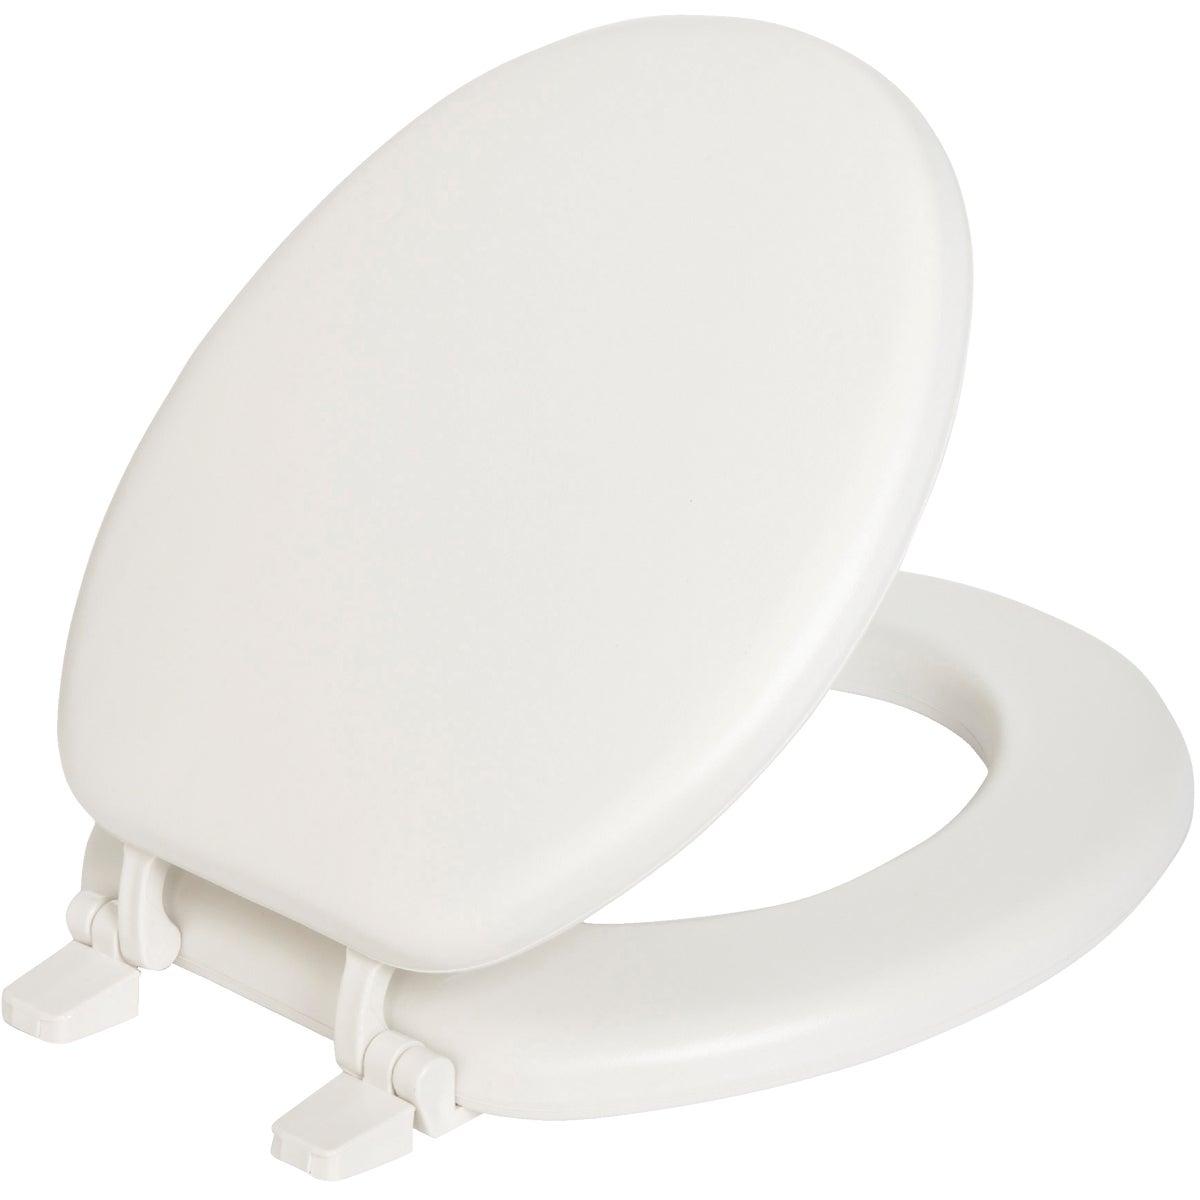 WHITE SOFT ECONOMY SEAT